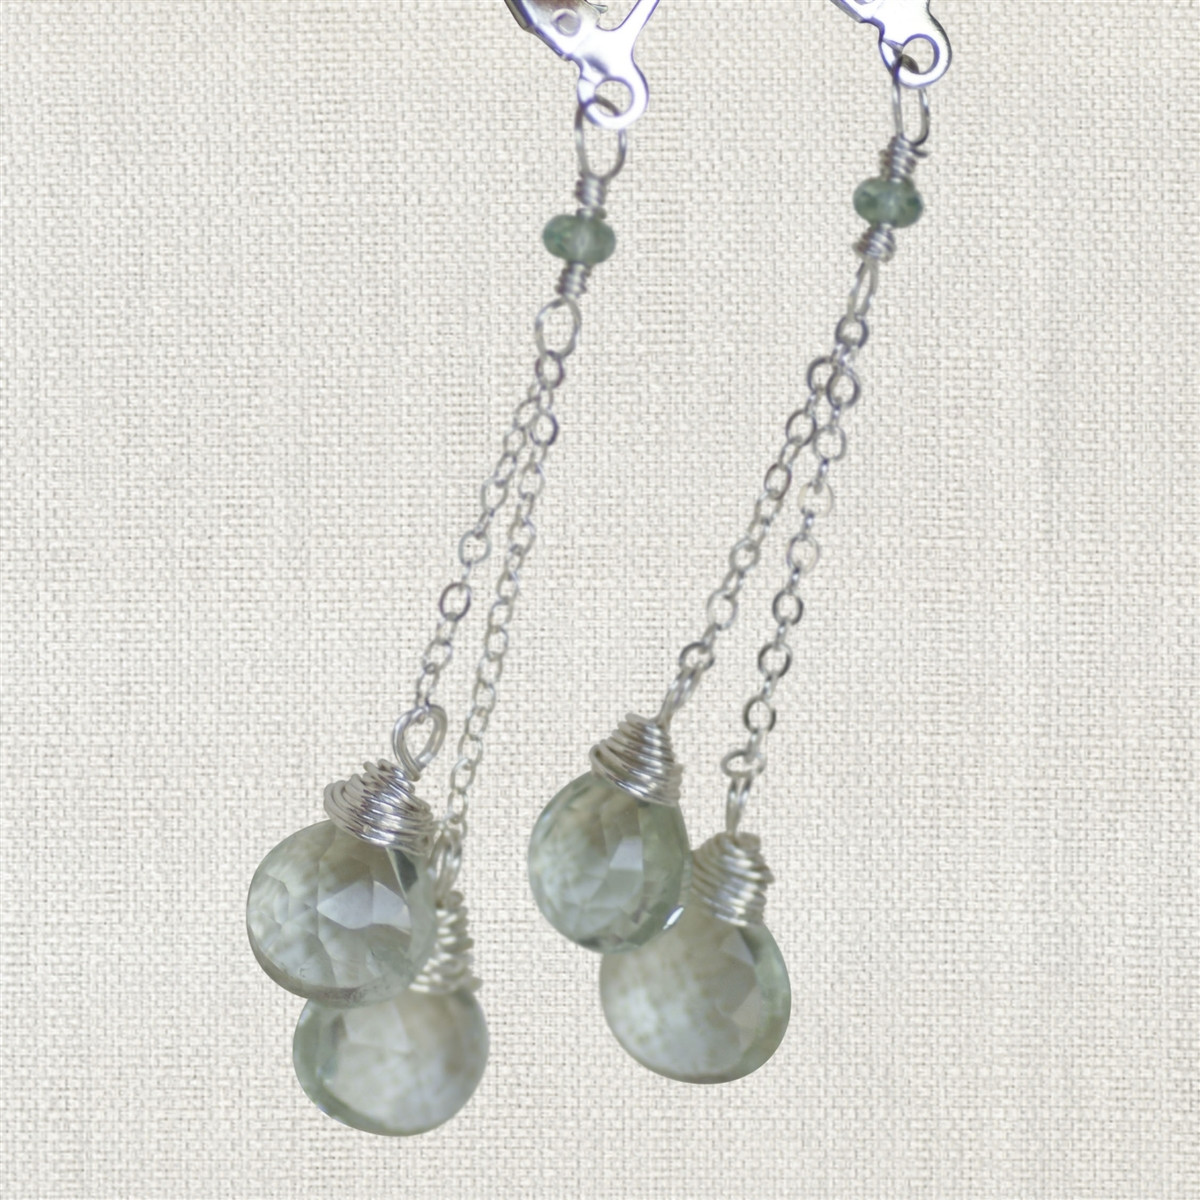 c76563ba4021c Aphrodite Dangle Earring